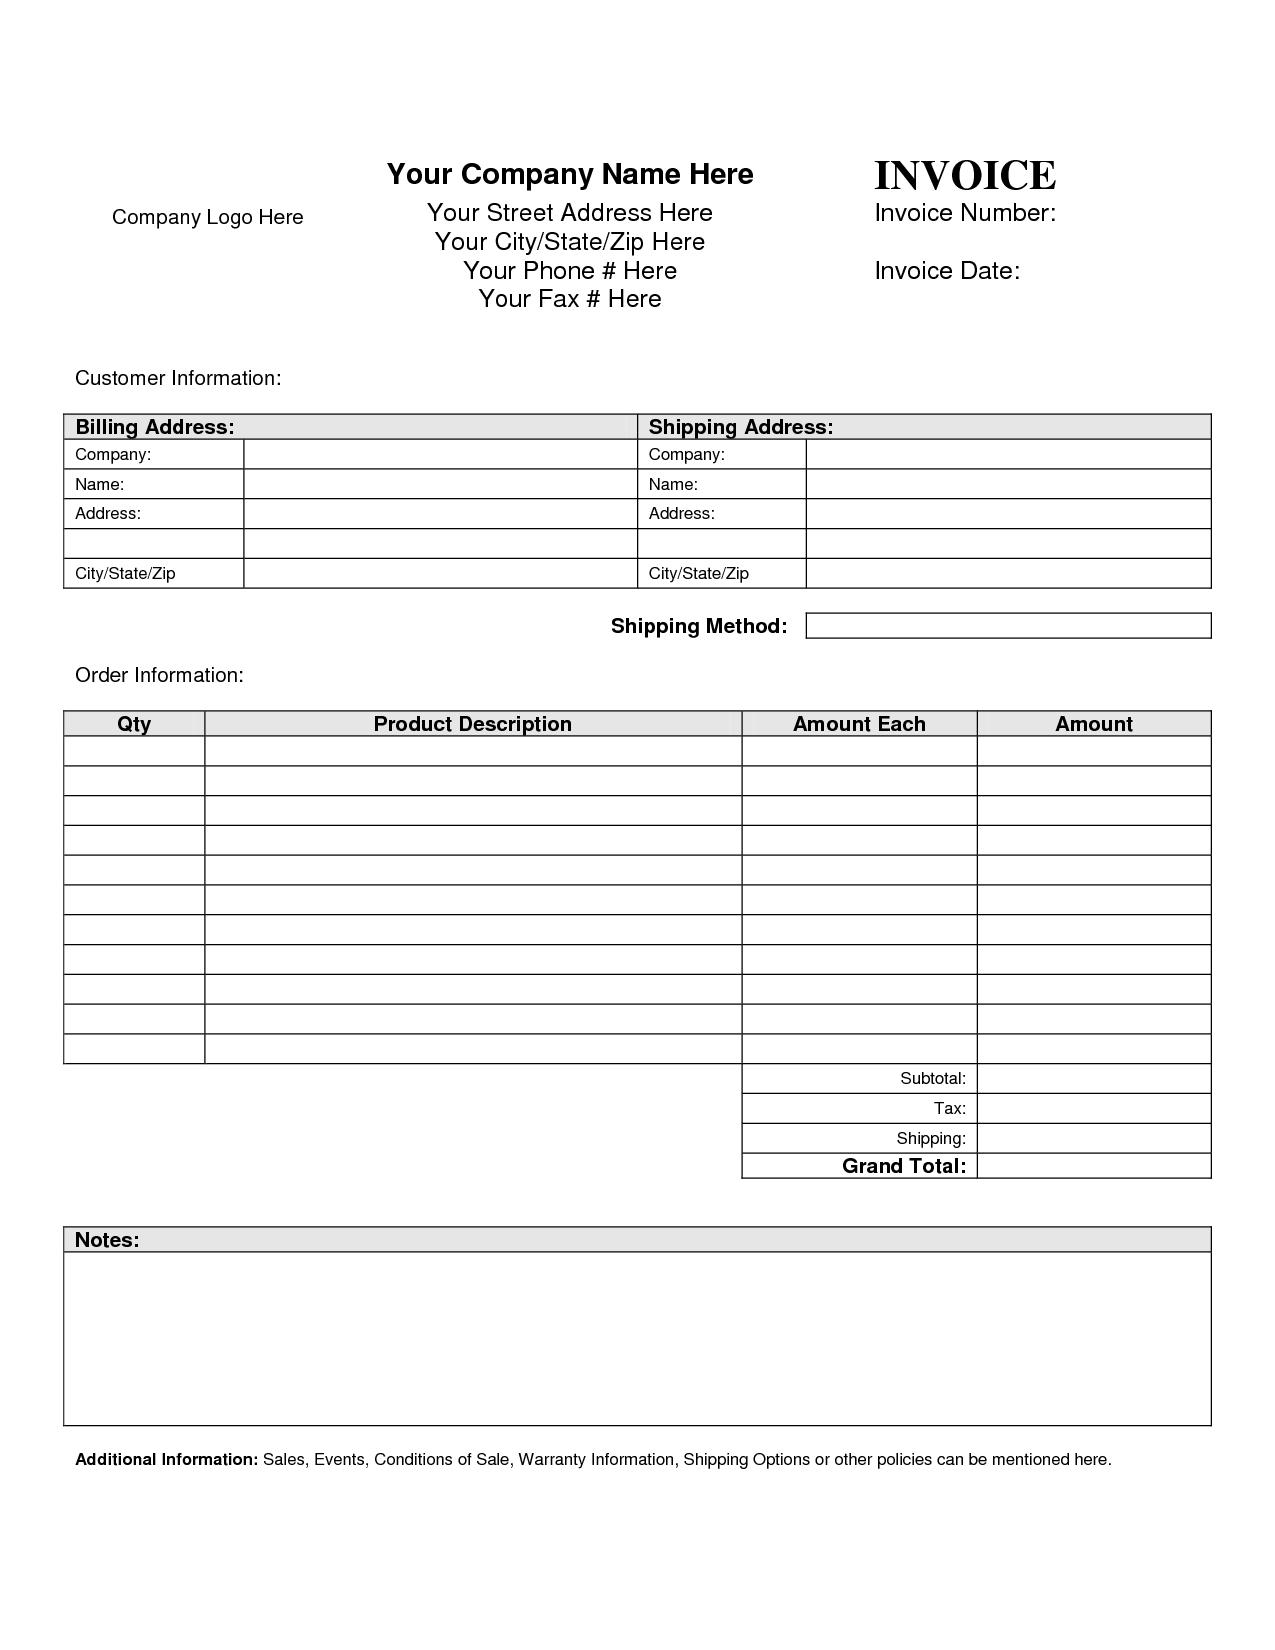 blank invoice templates blank invoice template blankinvoice 1275 X 1650